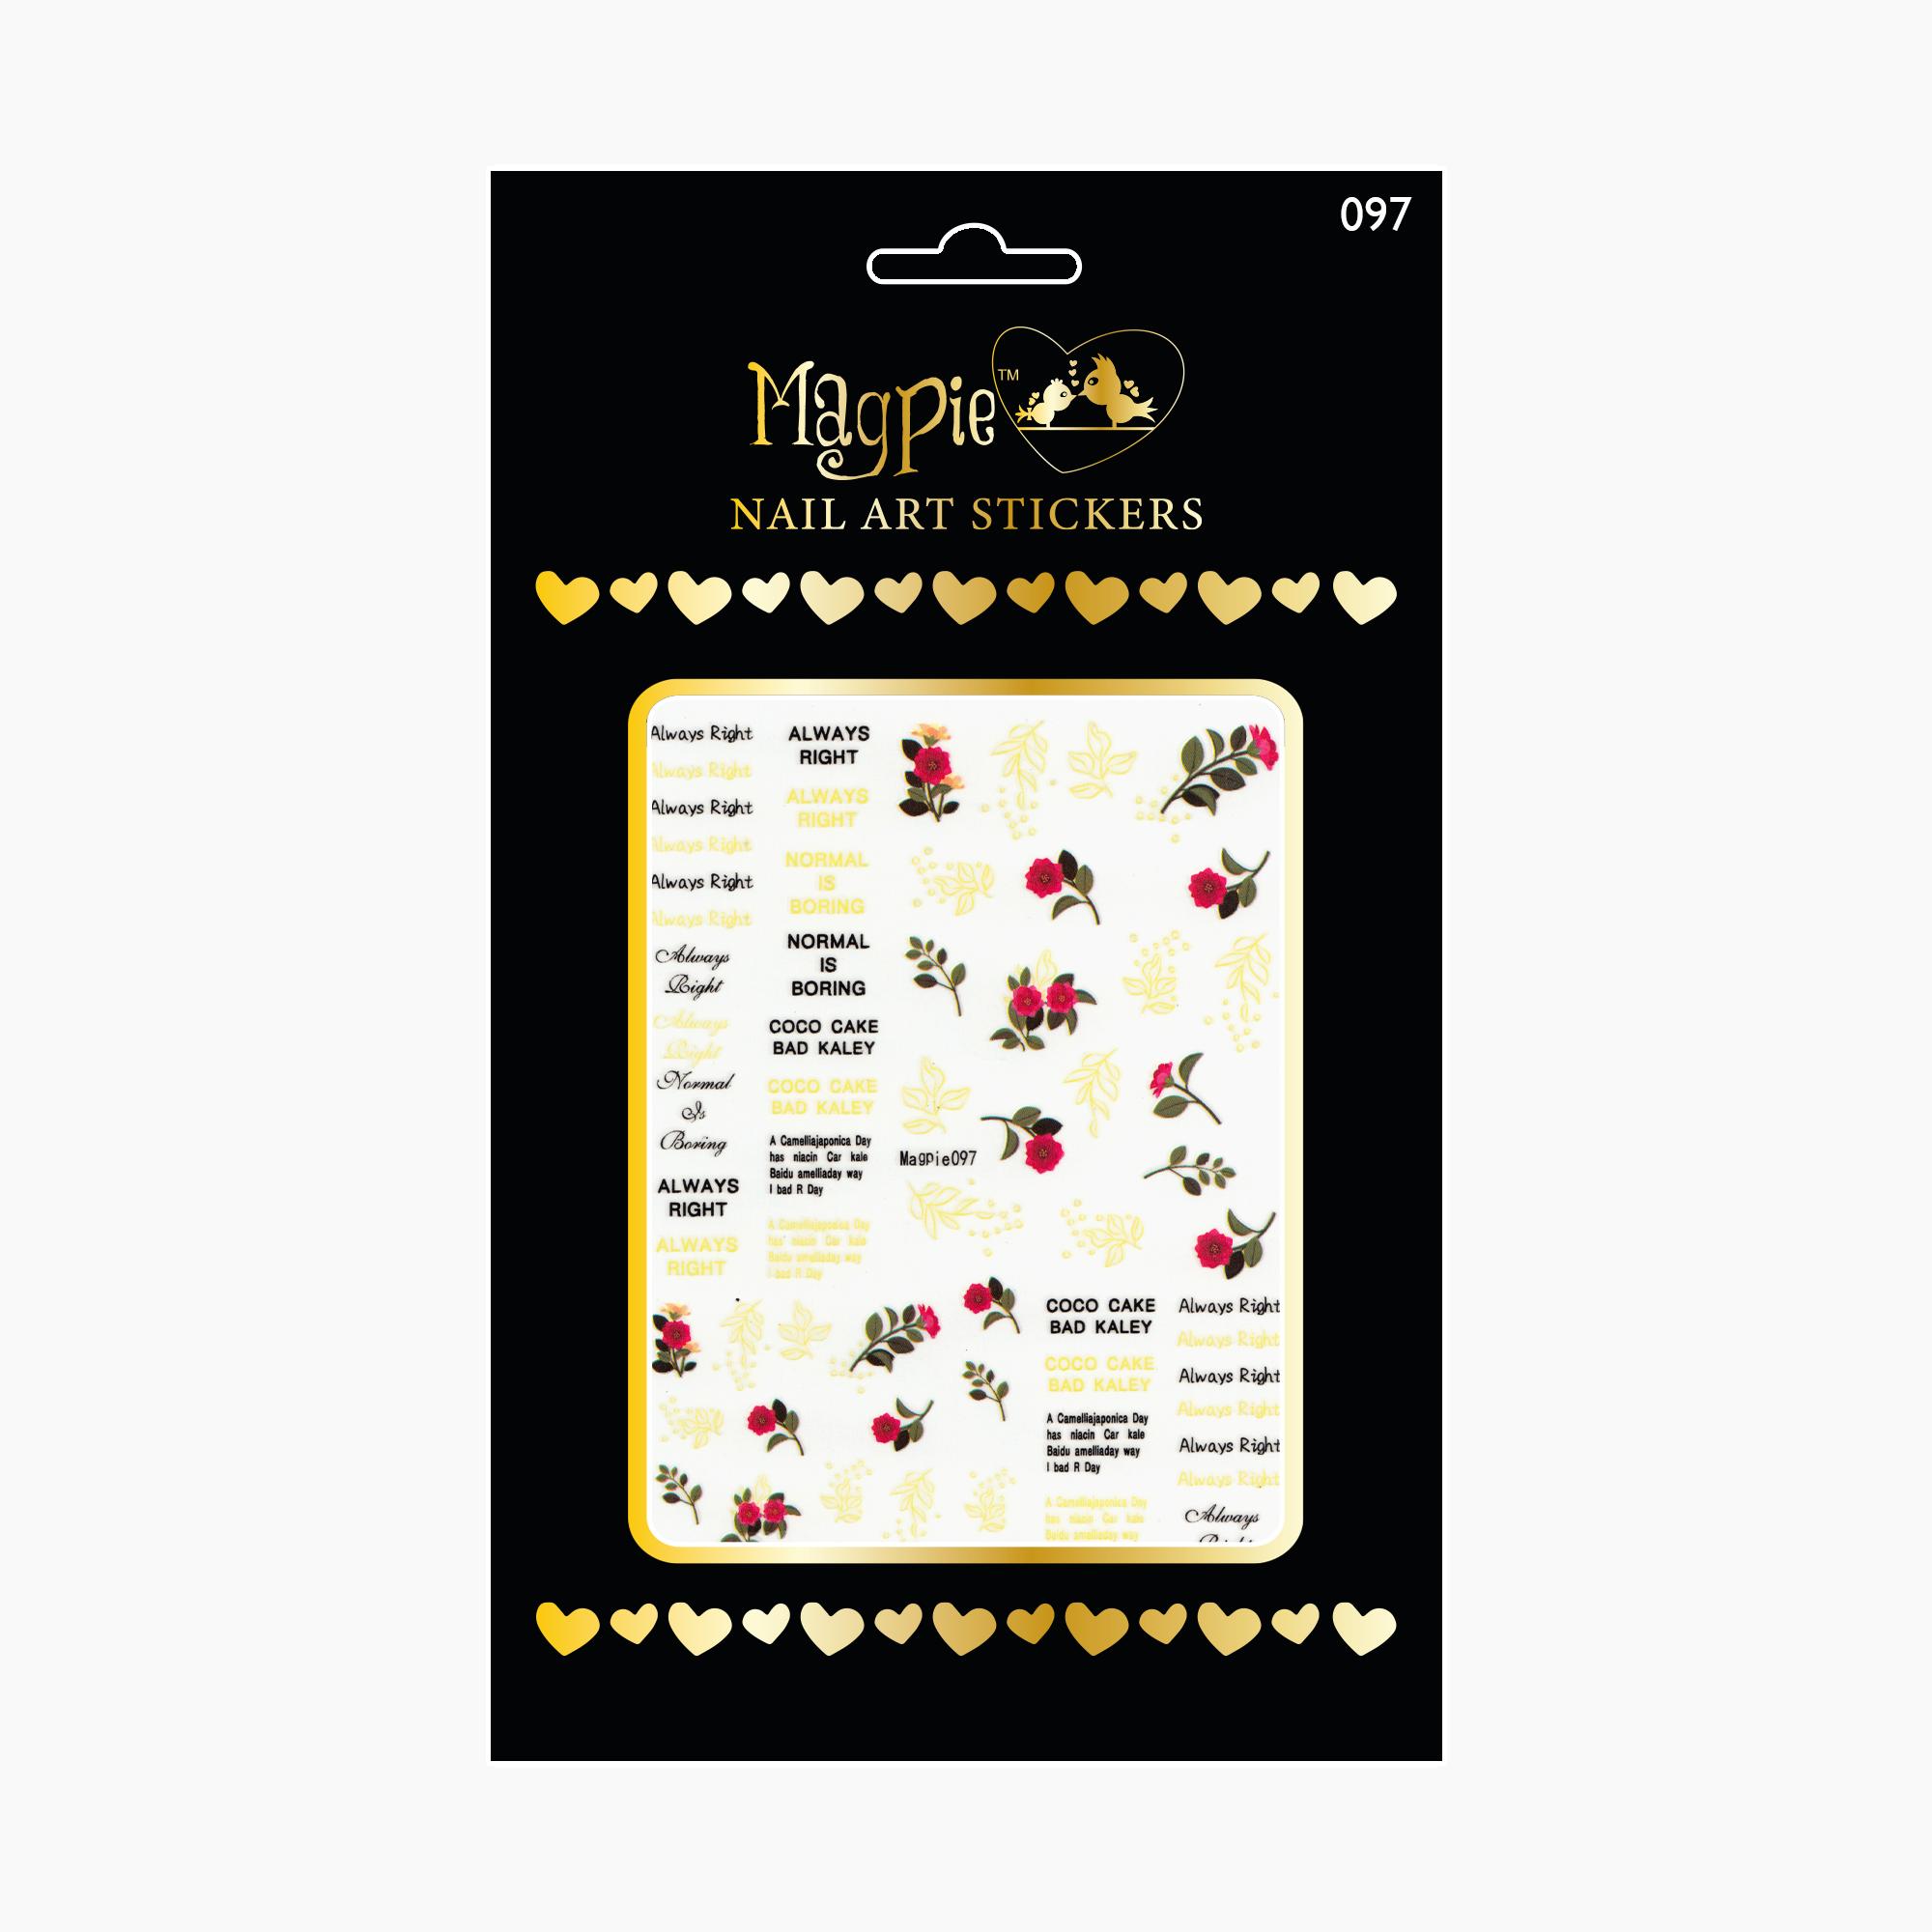 Magpie 097 stickers